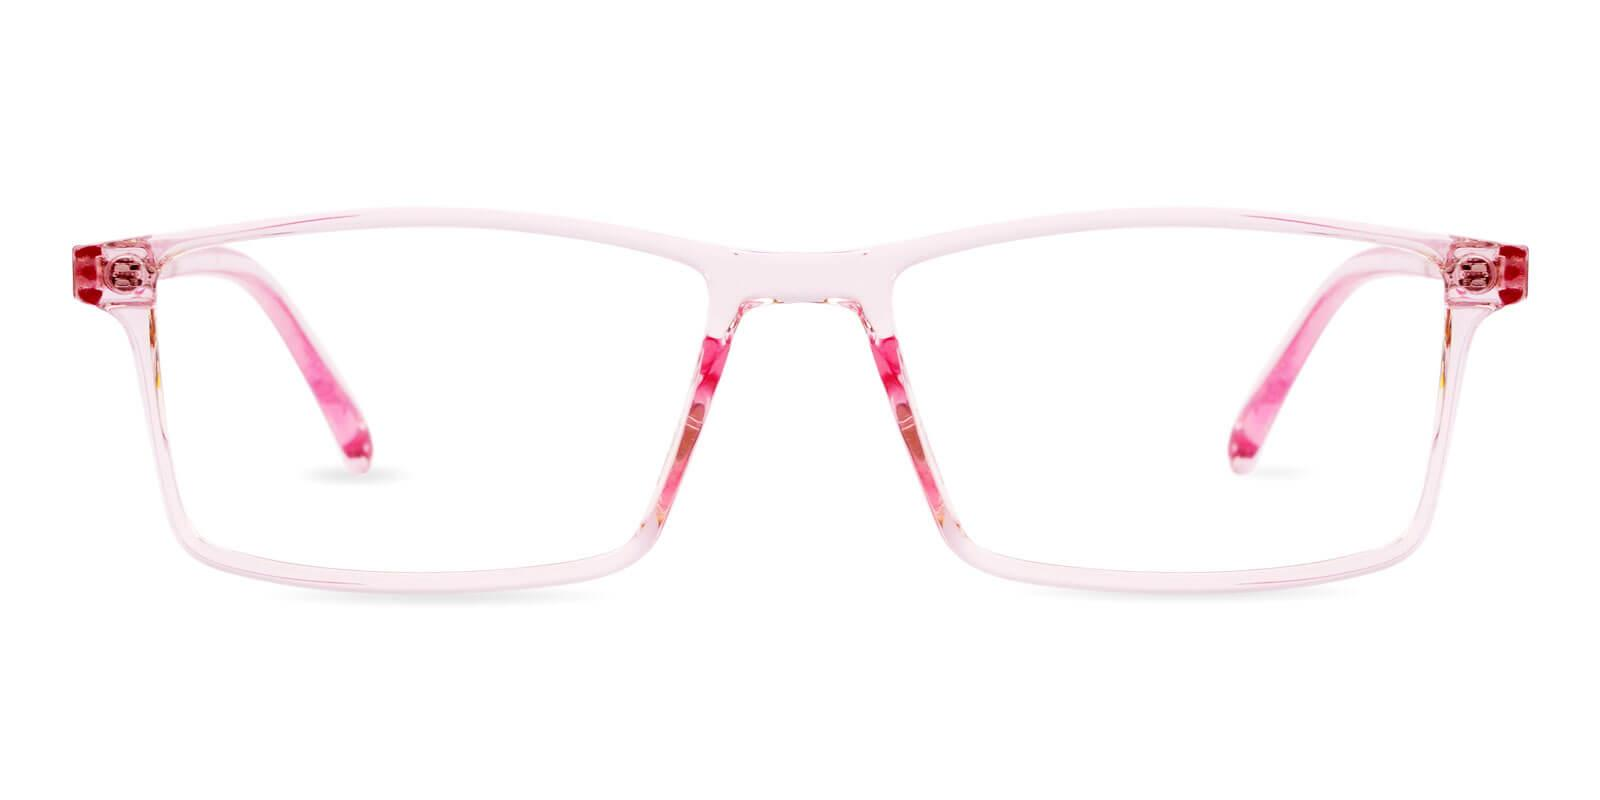 St Michel Pink TR Lightweight , UniversalBridgeFit , Eyeglasses Frames from ABBE Glasses